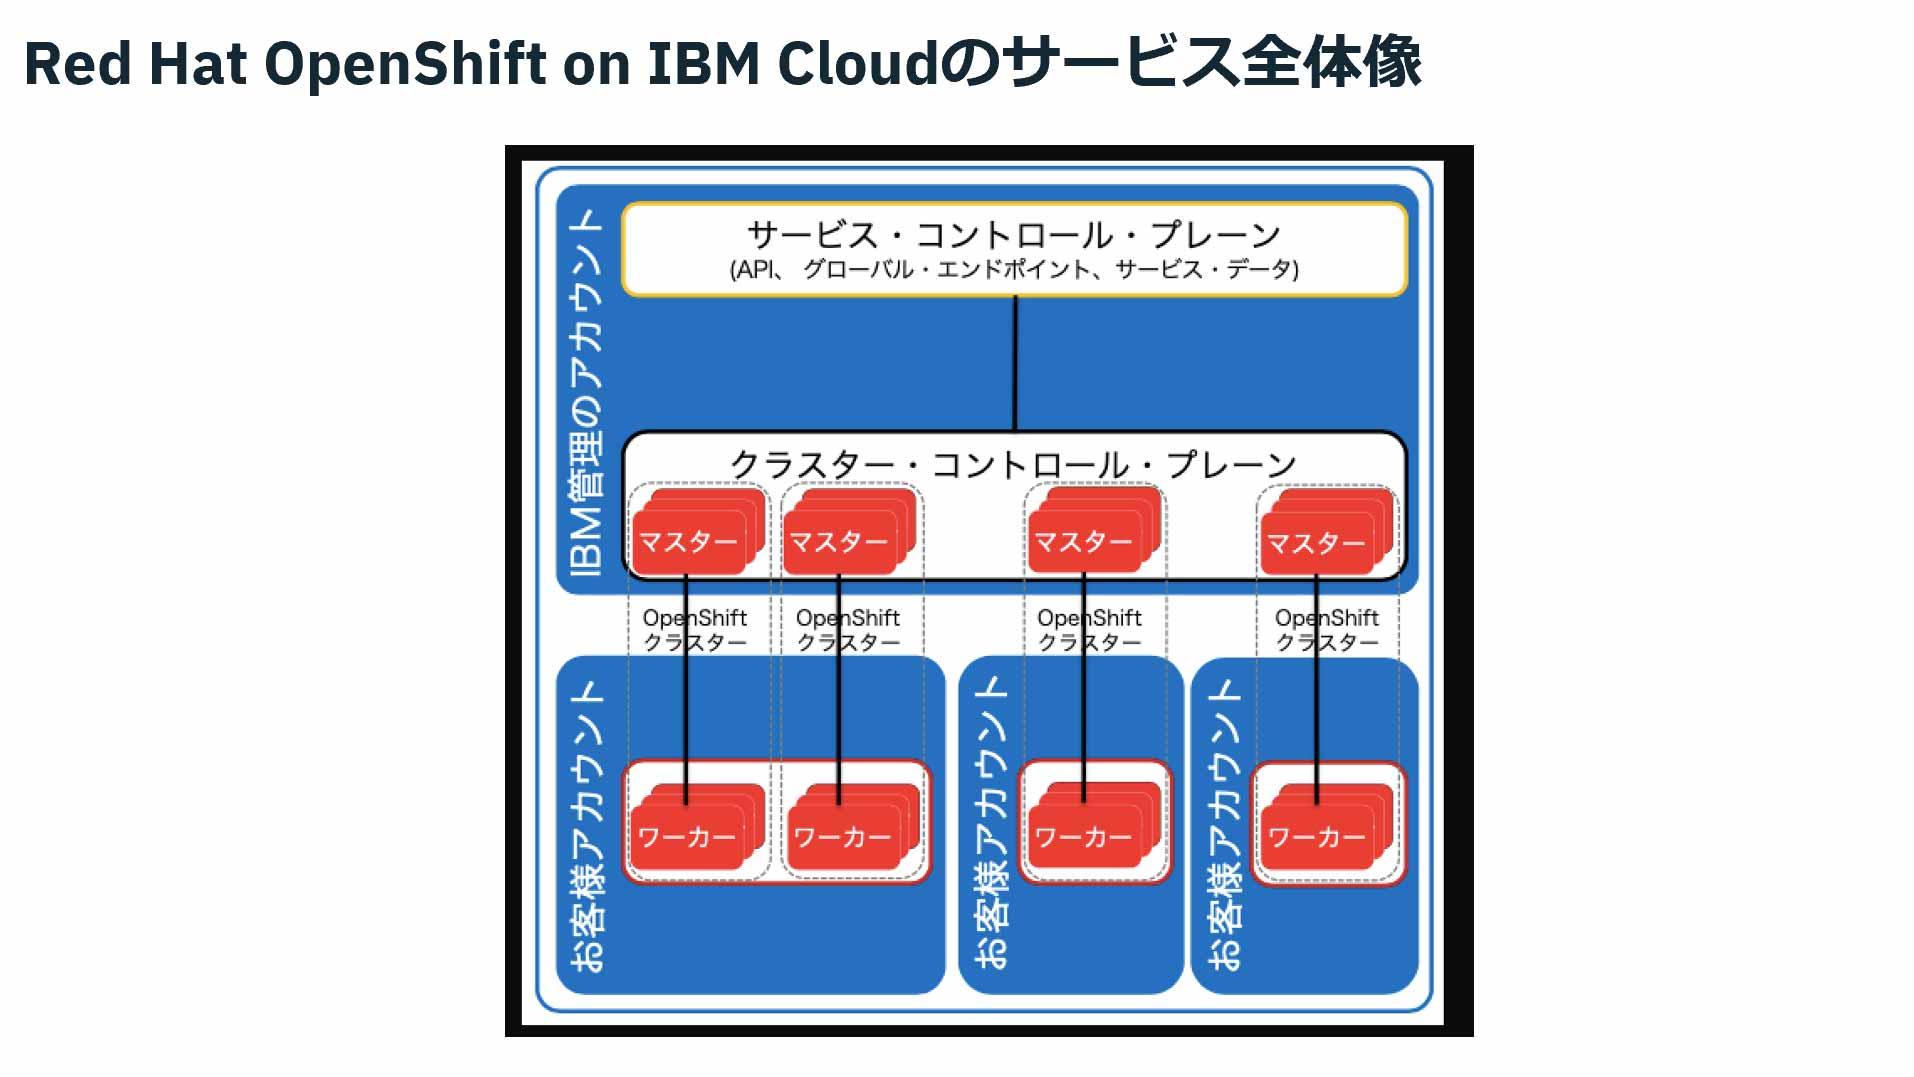 Red Hat OpenShift on IBM Cloudのサービス全体像